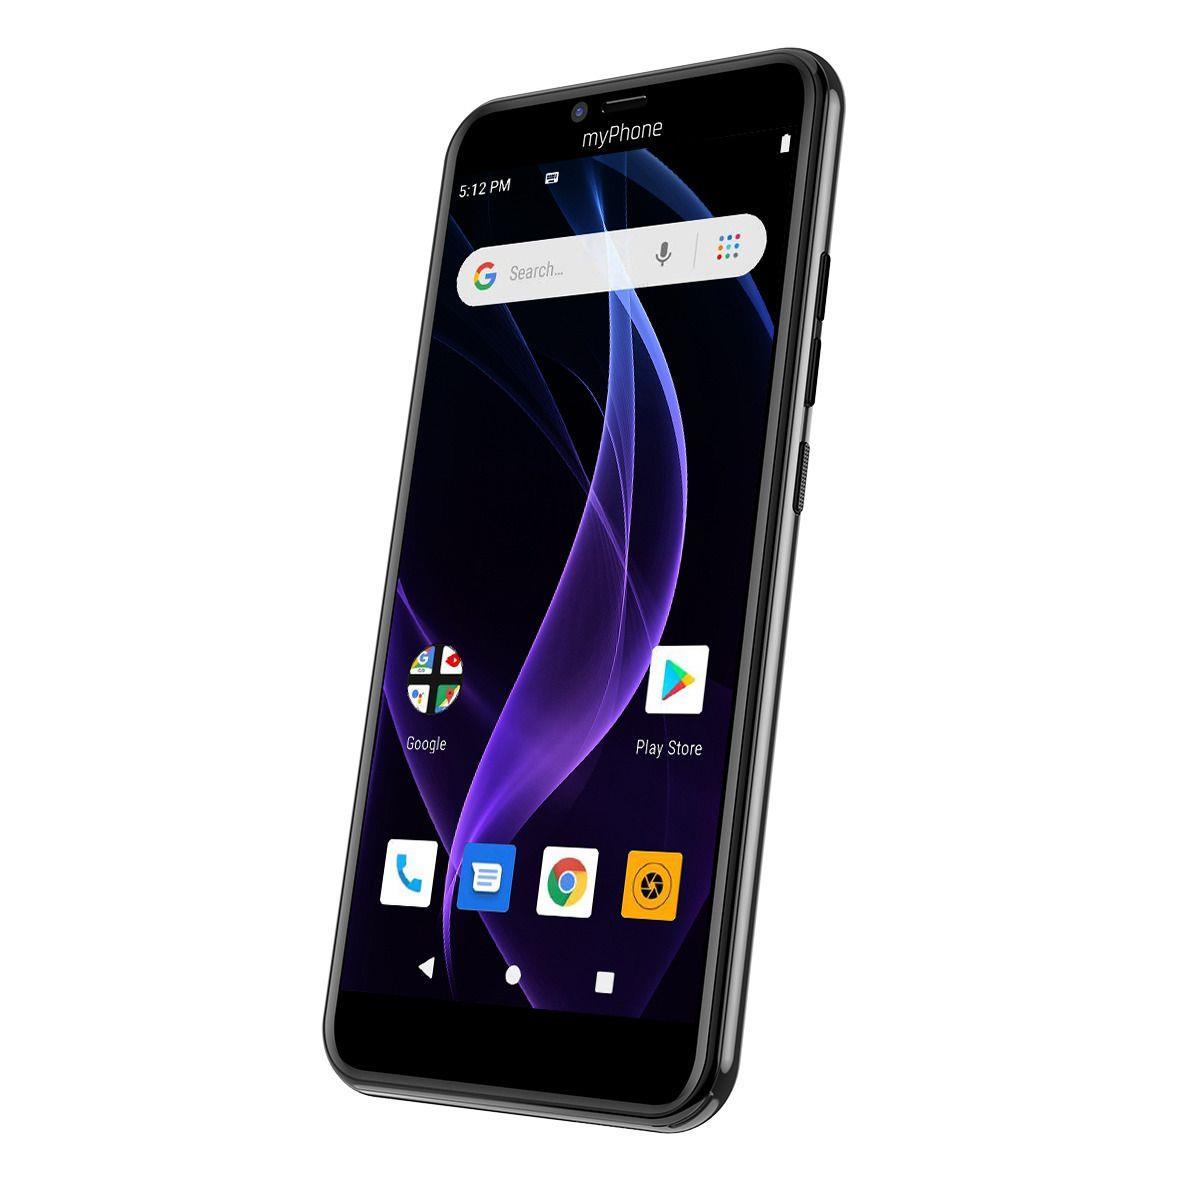 Telefon myPhone Prime 4 Lite modrý